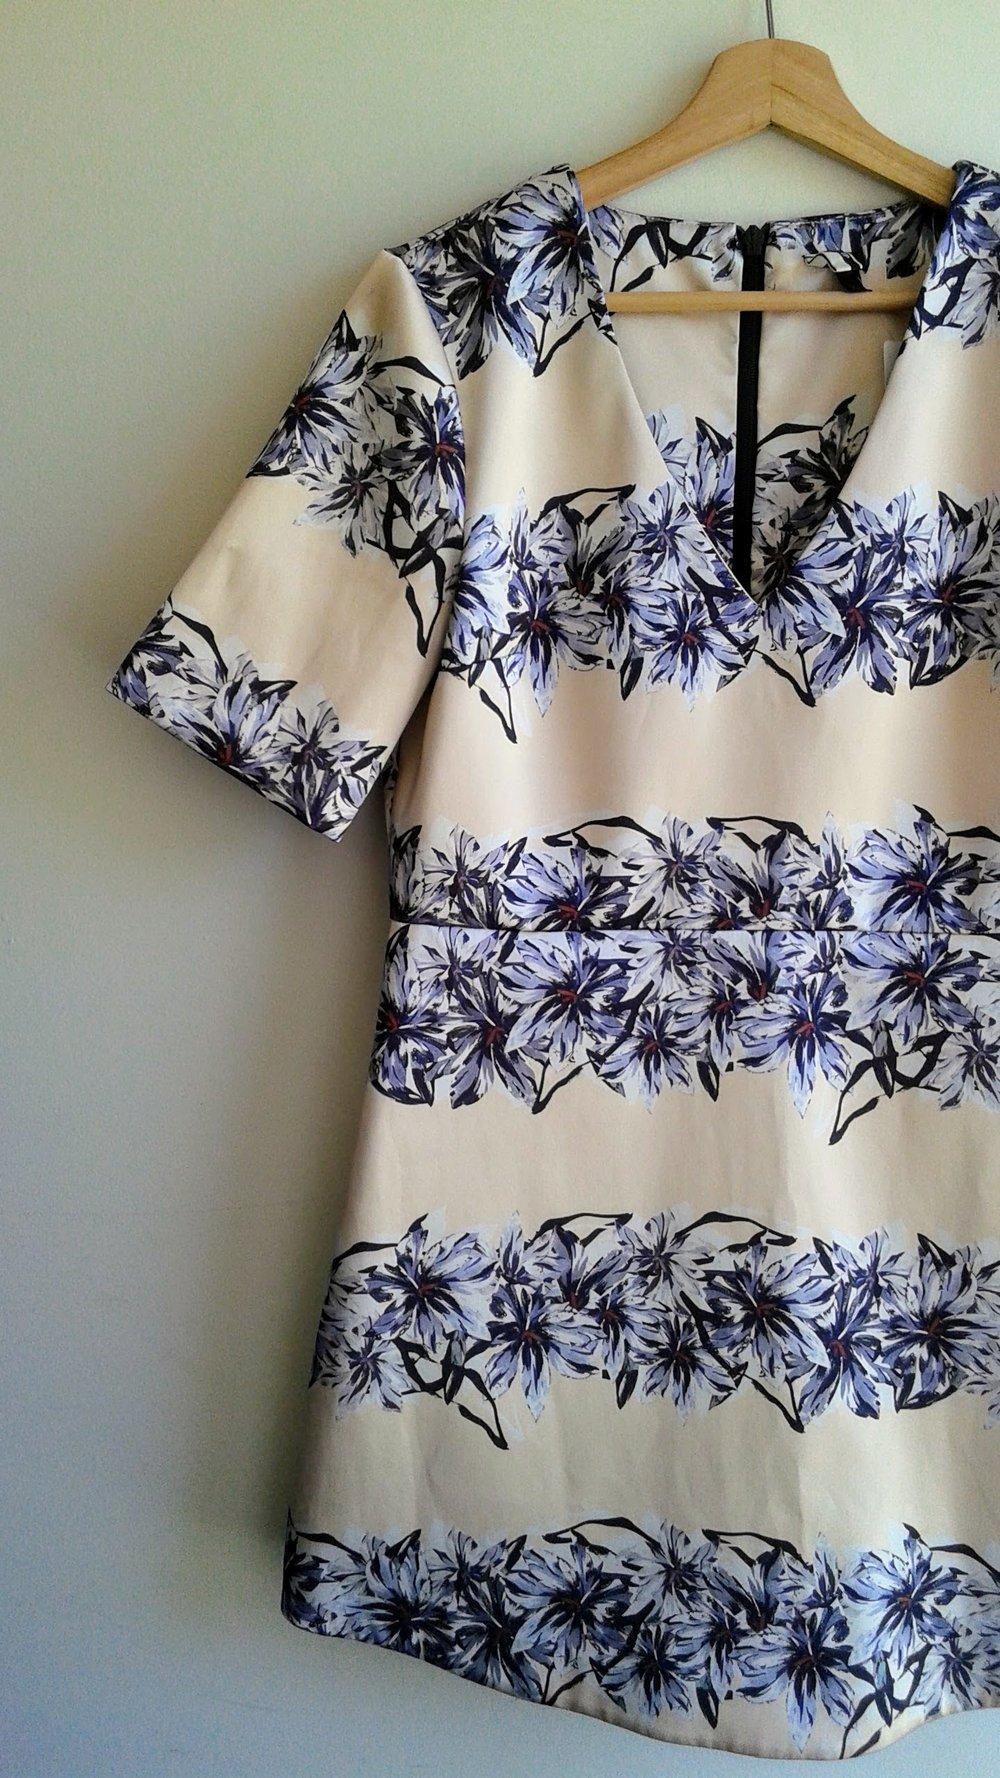 Topshop dress; S8, $38